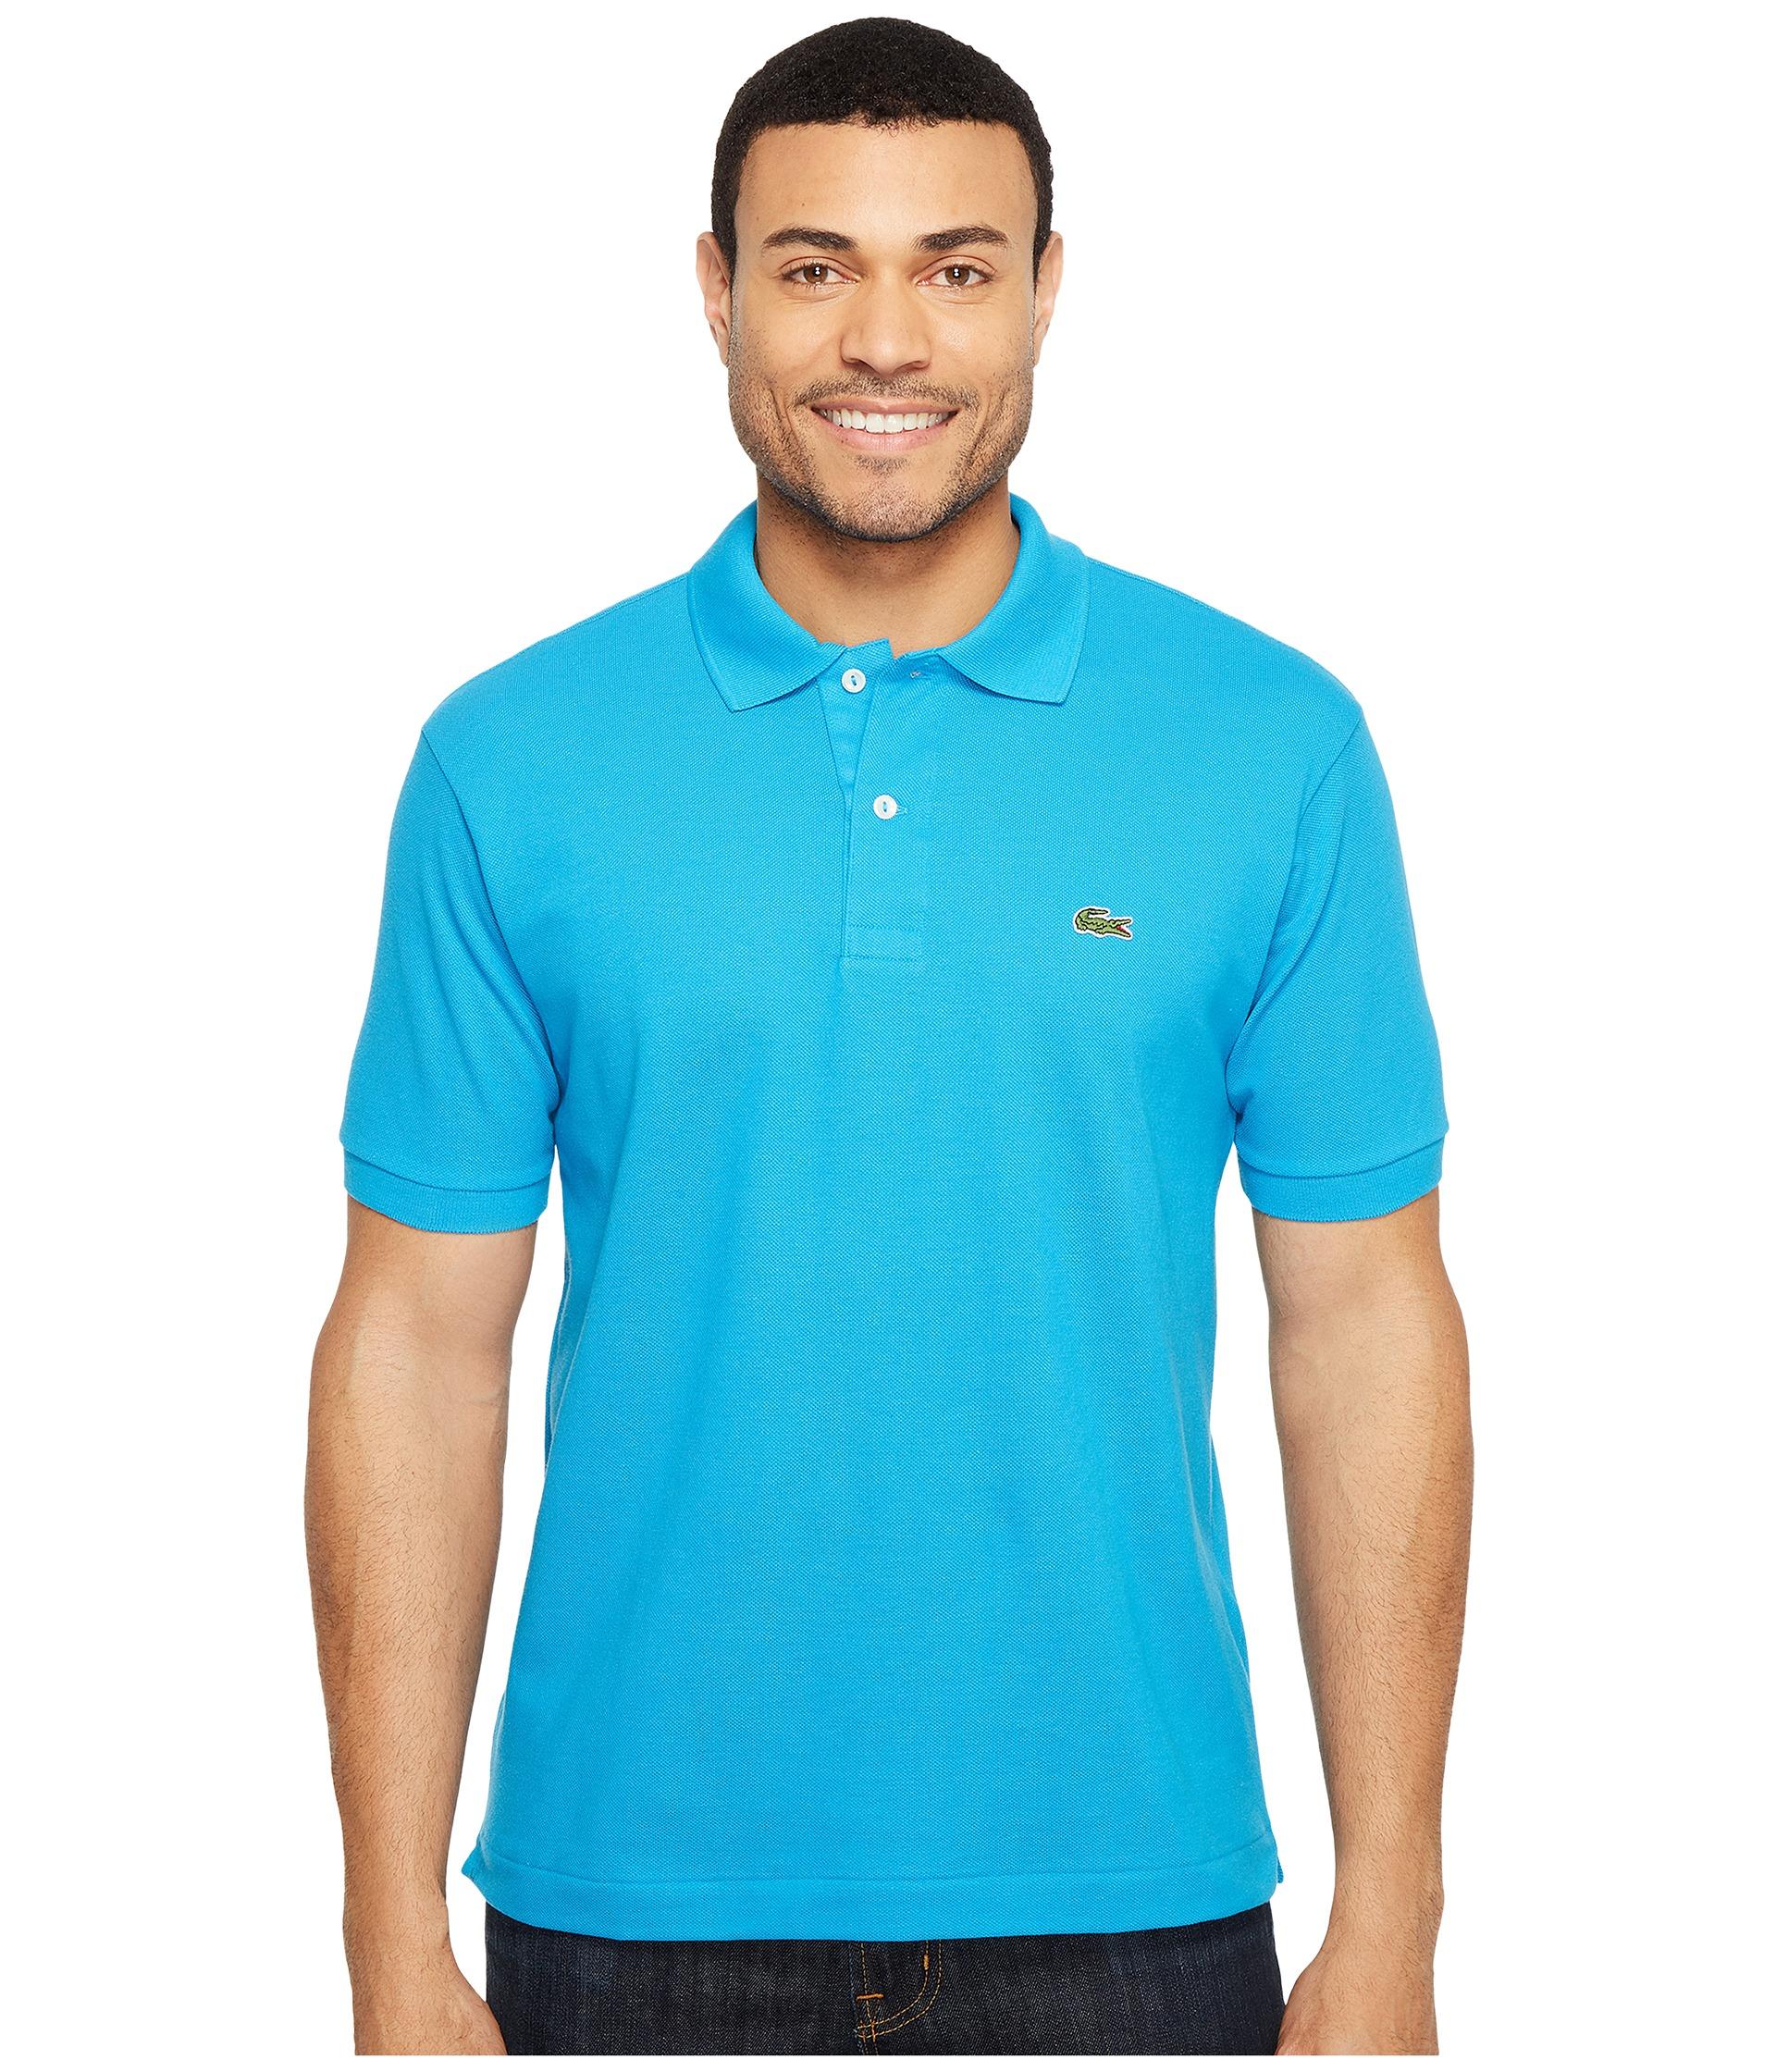 Lacoste l1212 classic pique polo shirt loire blue zappos for Lacoste size 4 polo shirt